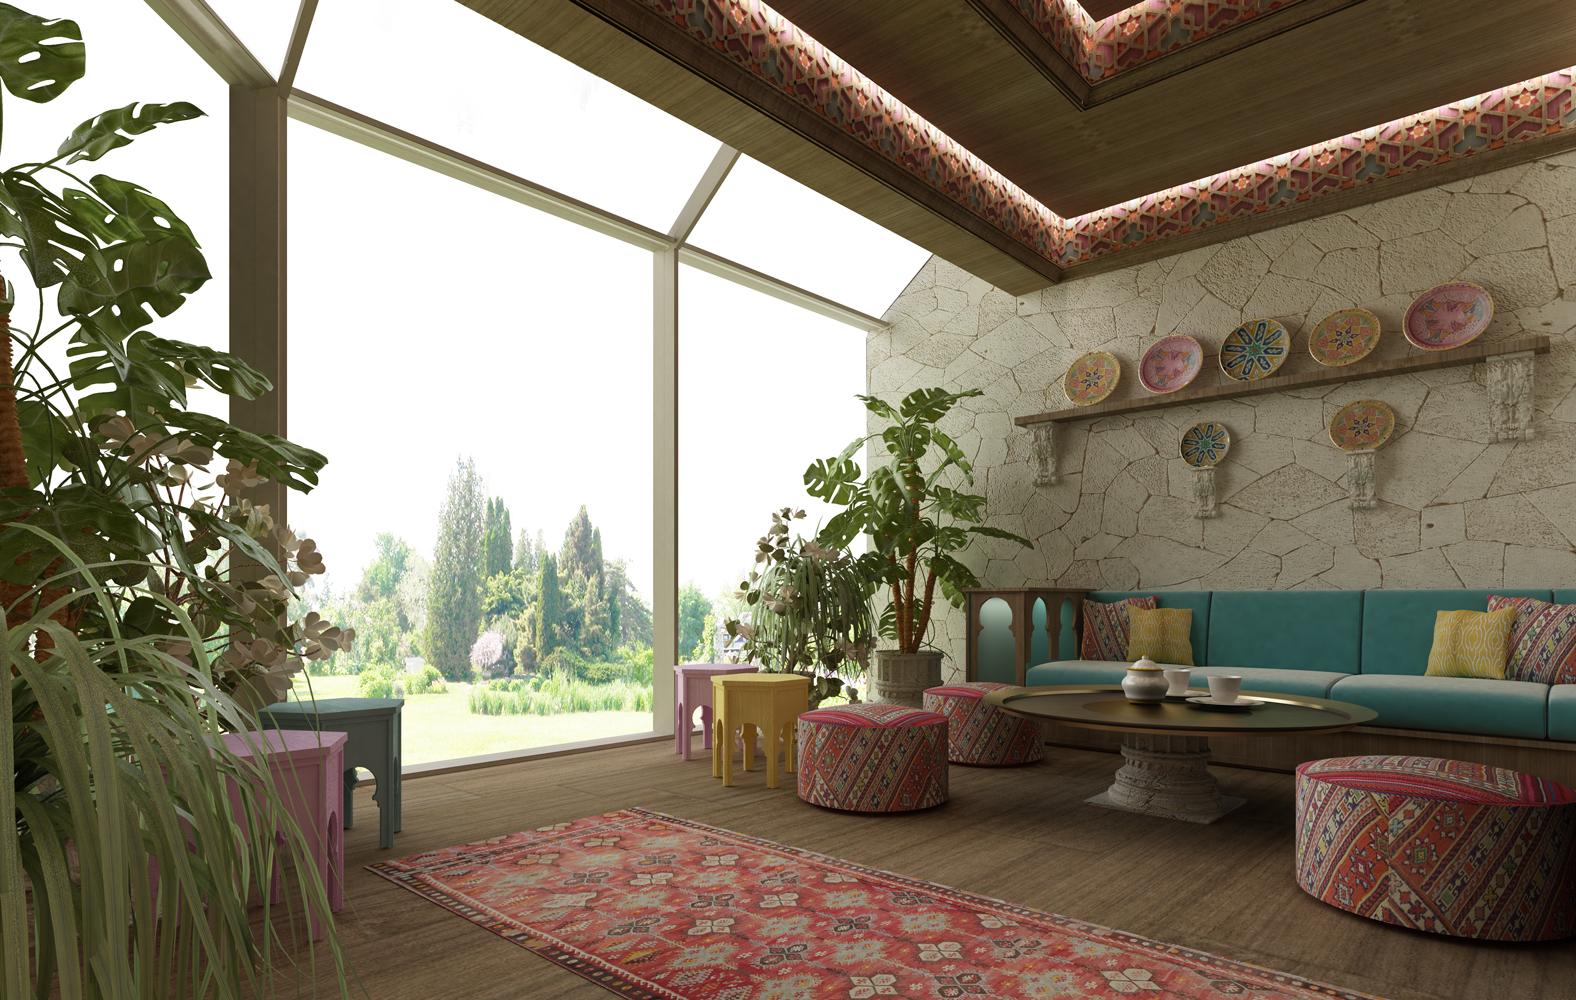 External Majlis Design Ideas